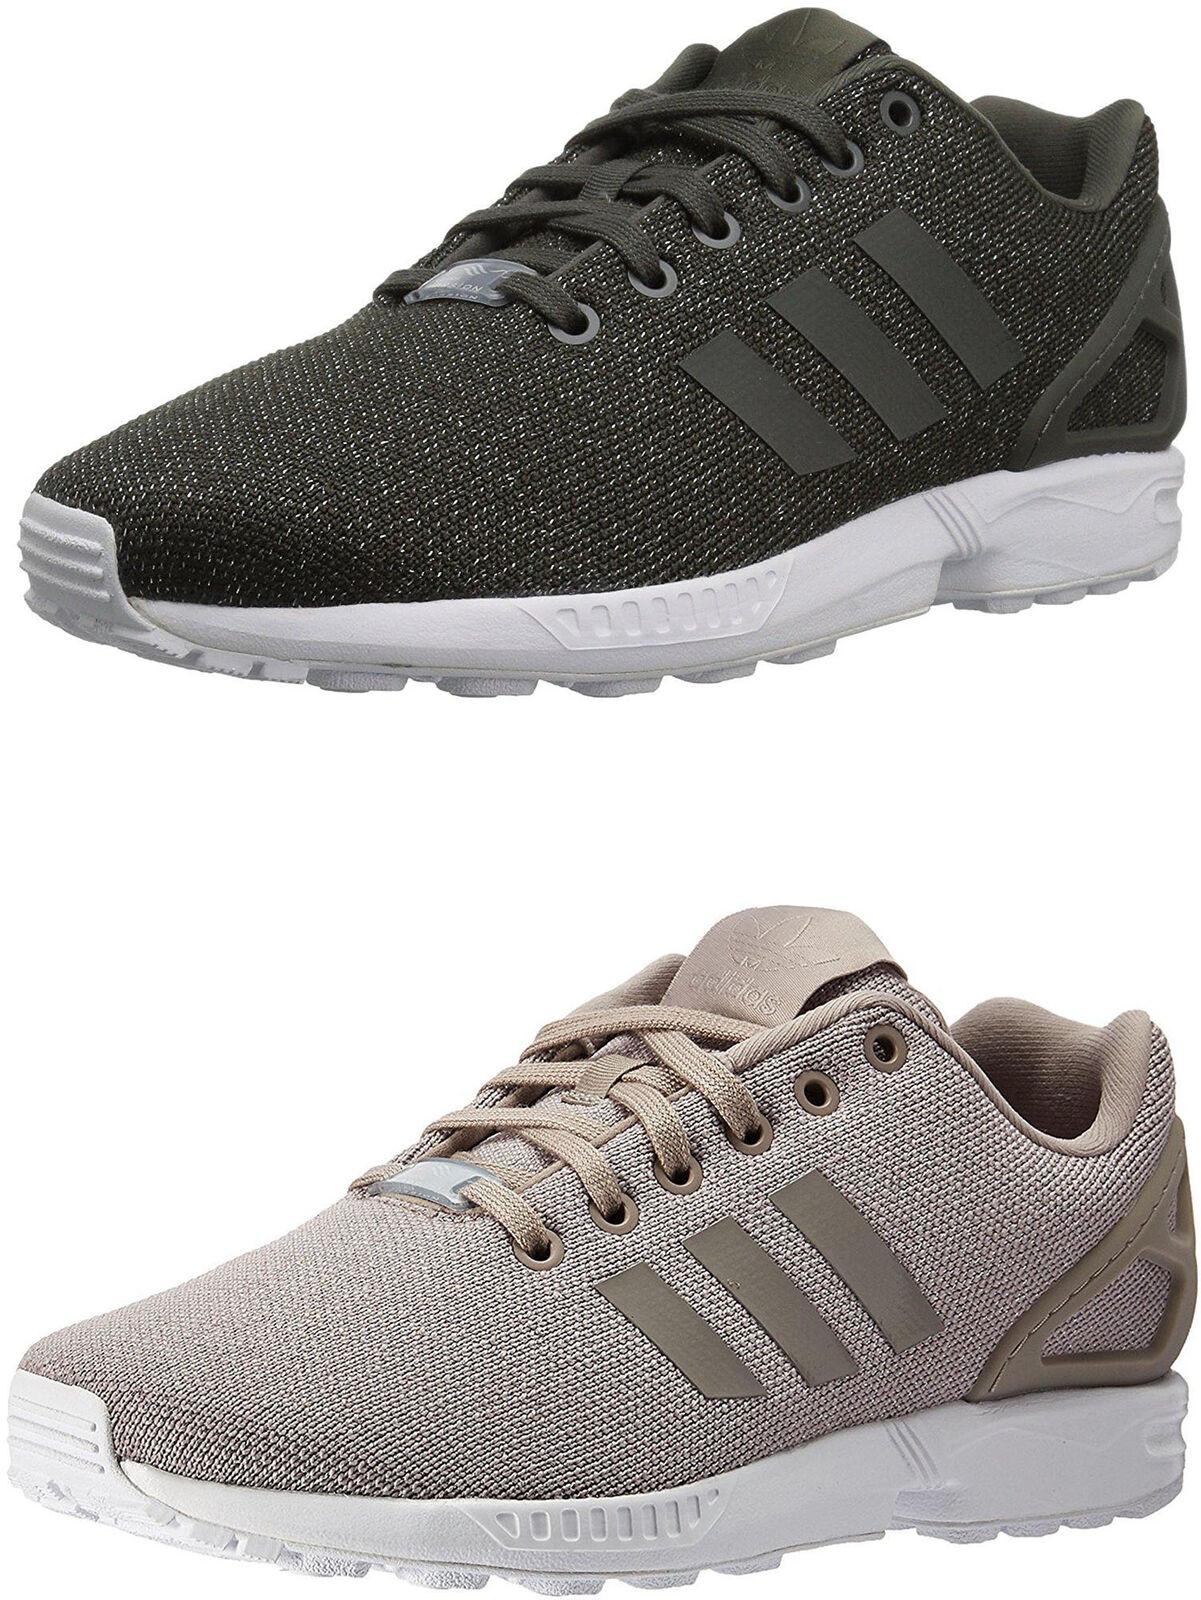 size 40 5dd98 41b58 adidas Originals Women s ZX Flux Running Shoes, Shoes, Shoes, 2 Colors  9b0ca4